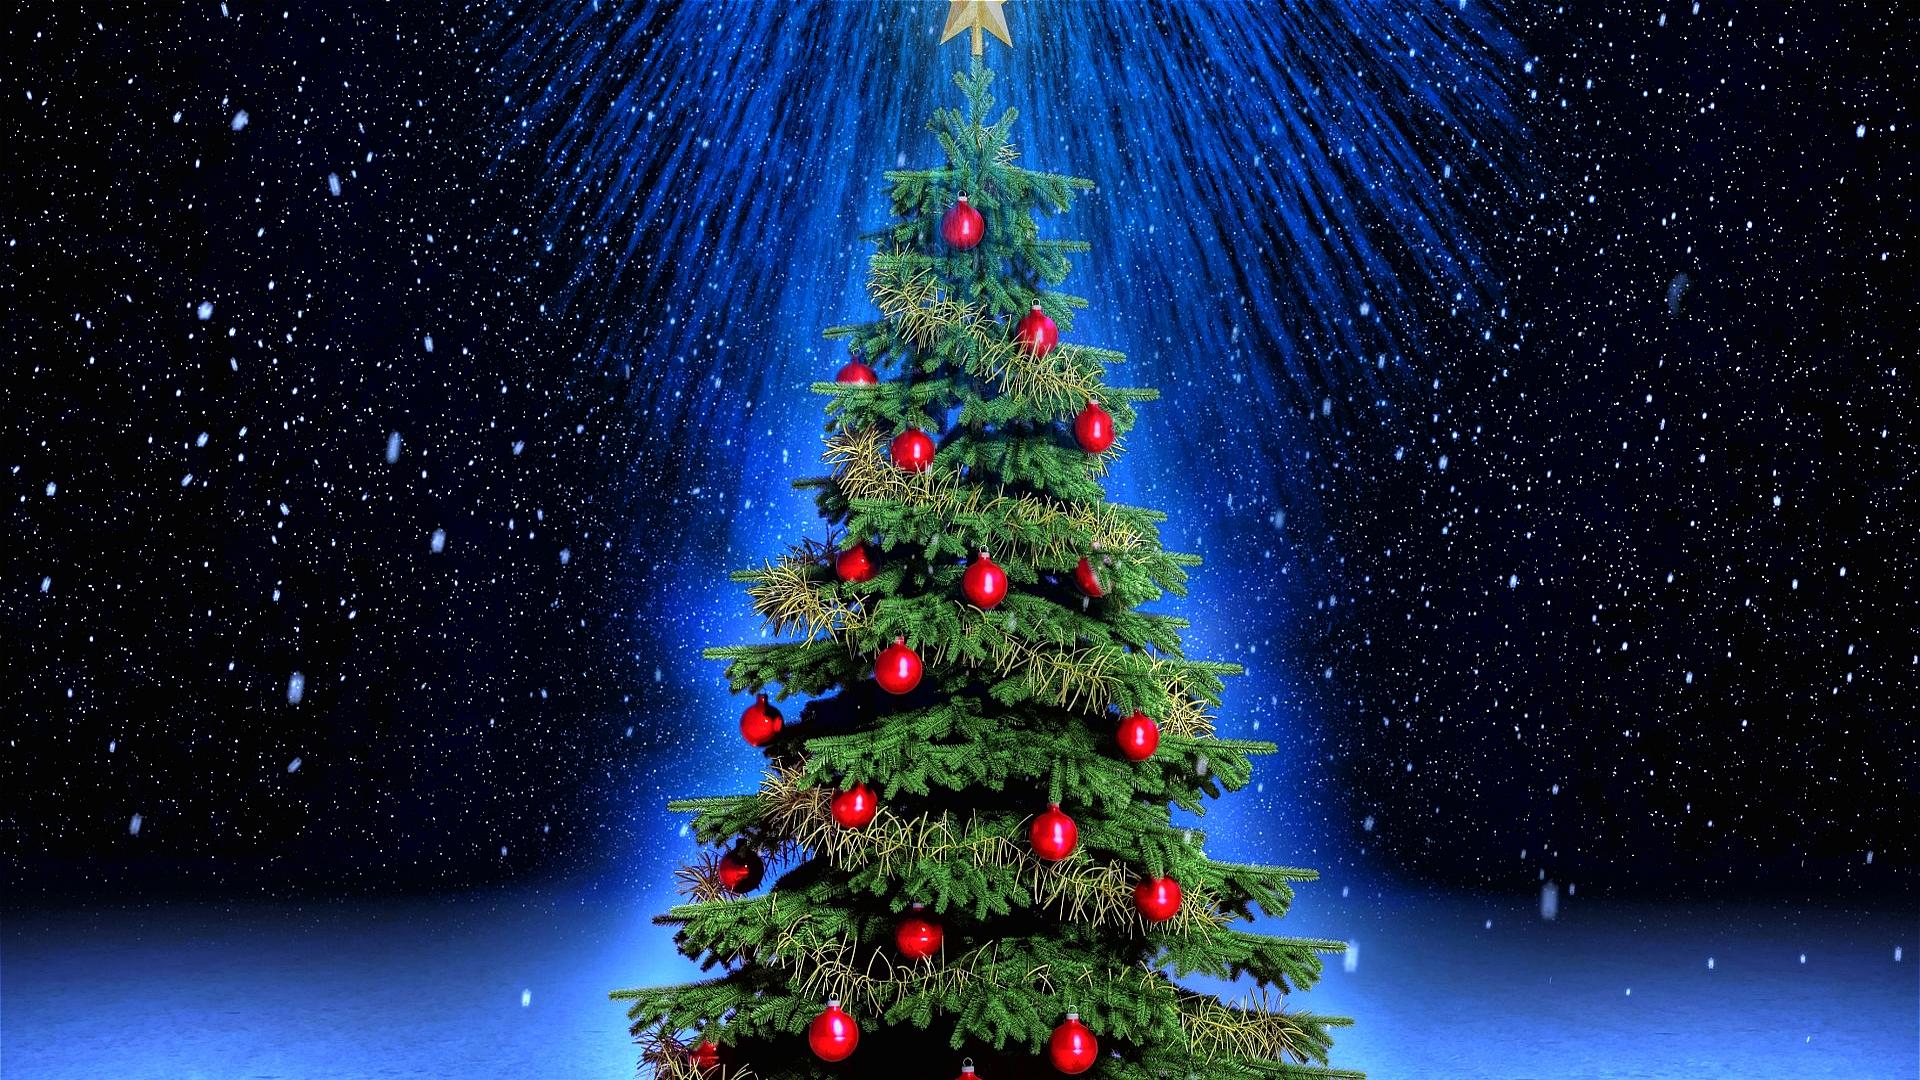 Holiday Christmas Hd Wallpaper: Christmas HD Widescreen Wallpaper 1920x1080